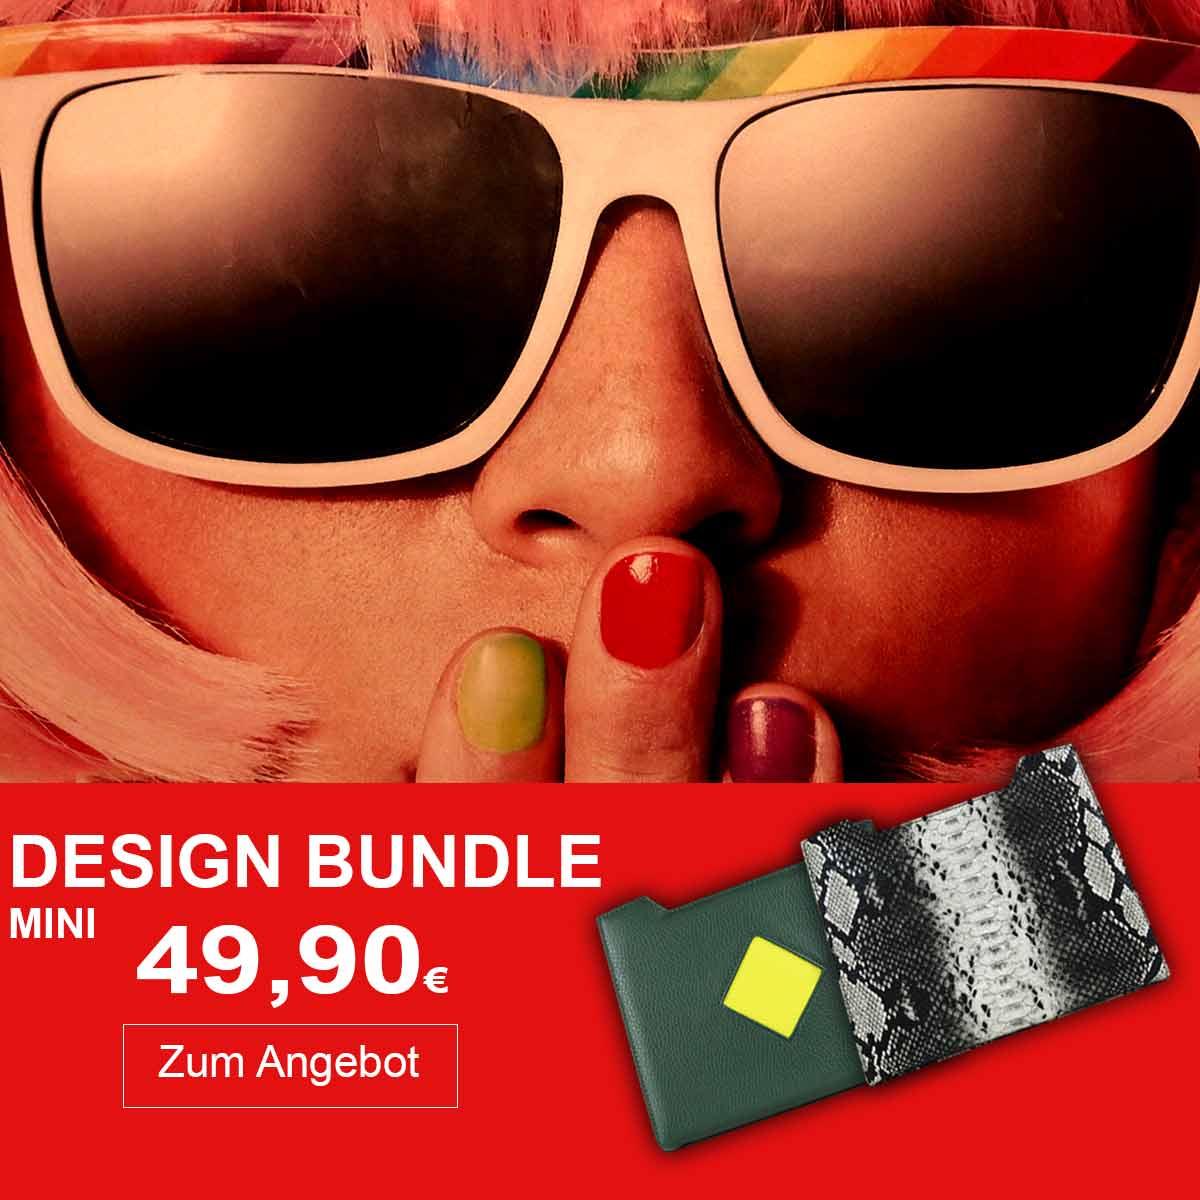 Design Bundle mini Juni